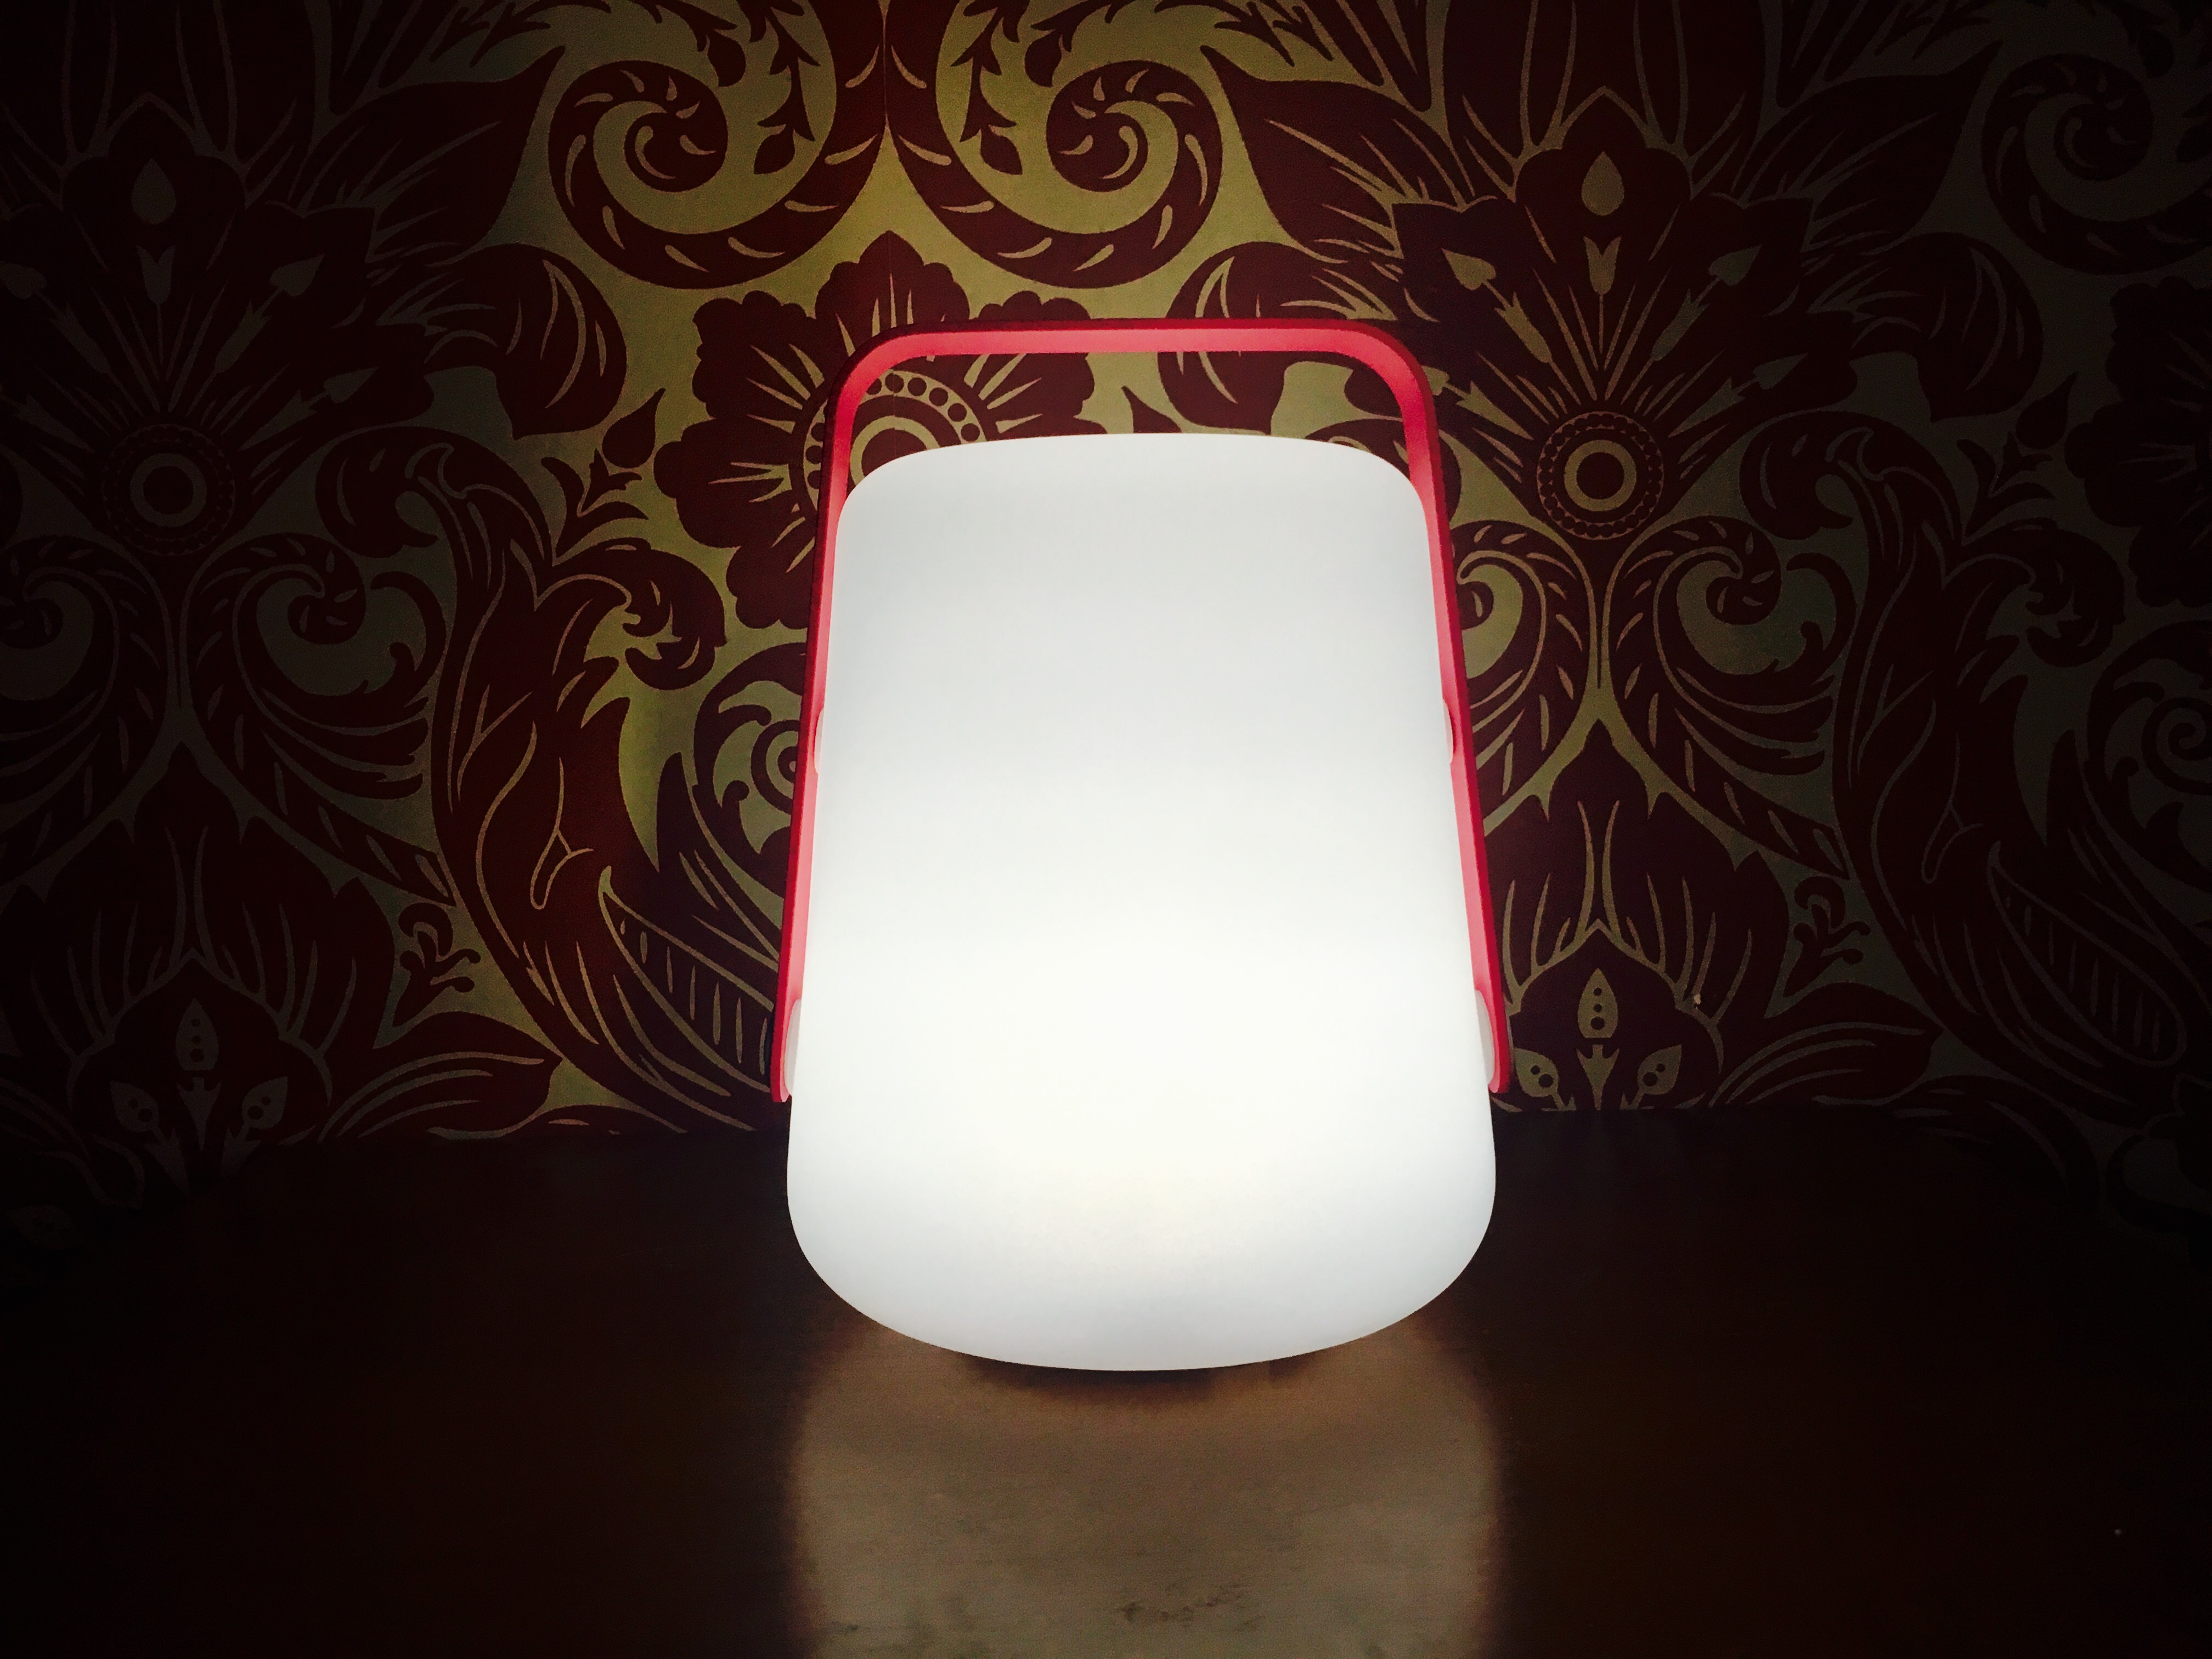 Lampade per esterni moderne: lampada da parete ip sovil luci esterne